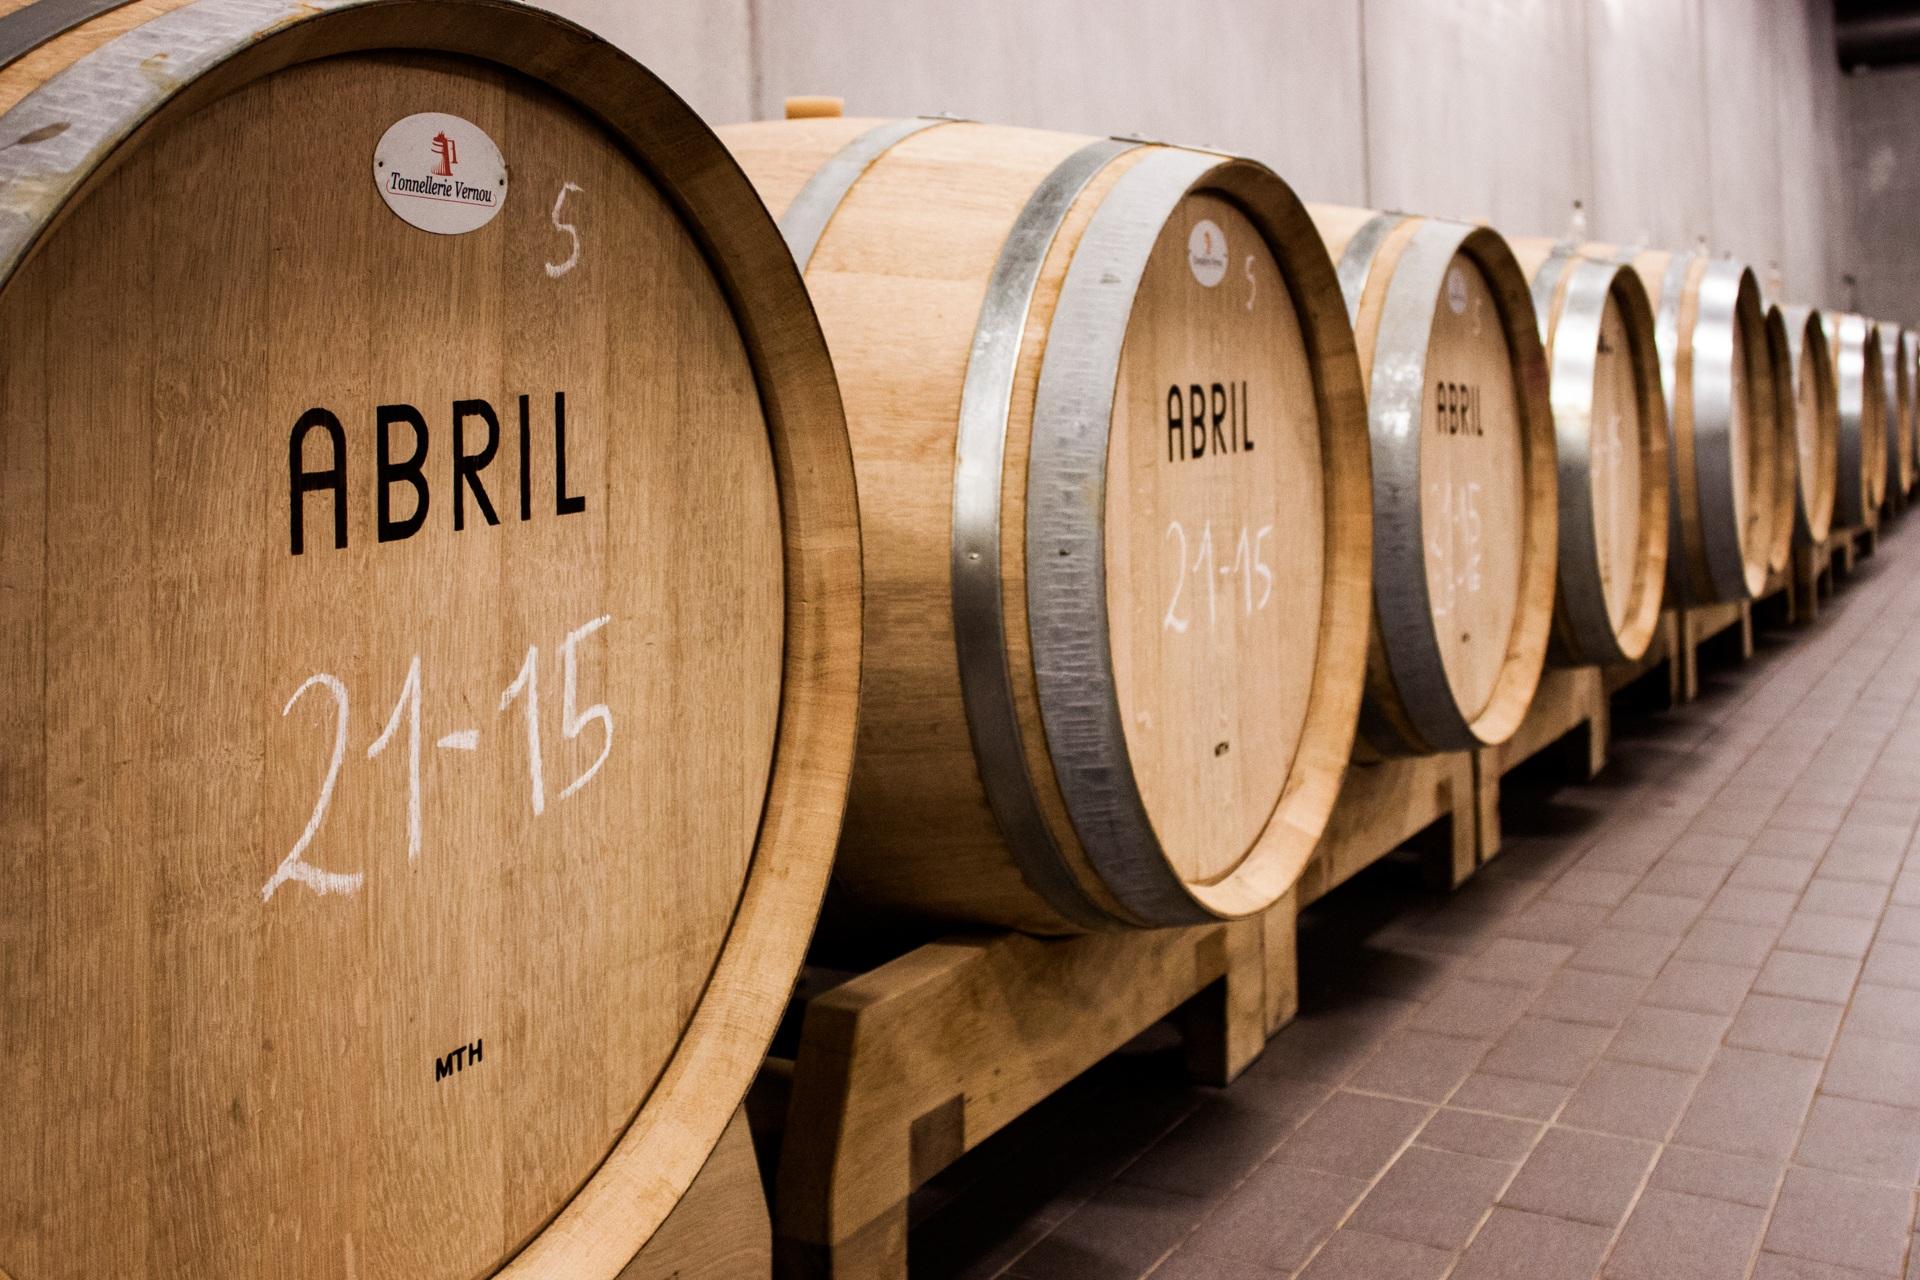 Wood Wine Red Red Wine Barrel Barrels Winery Cellar Keller Wooden Barrels  Winemaker Wine Storage Wine